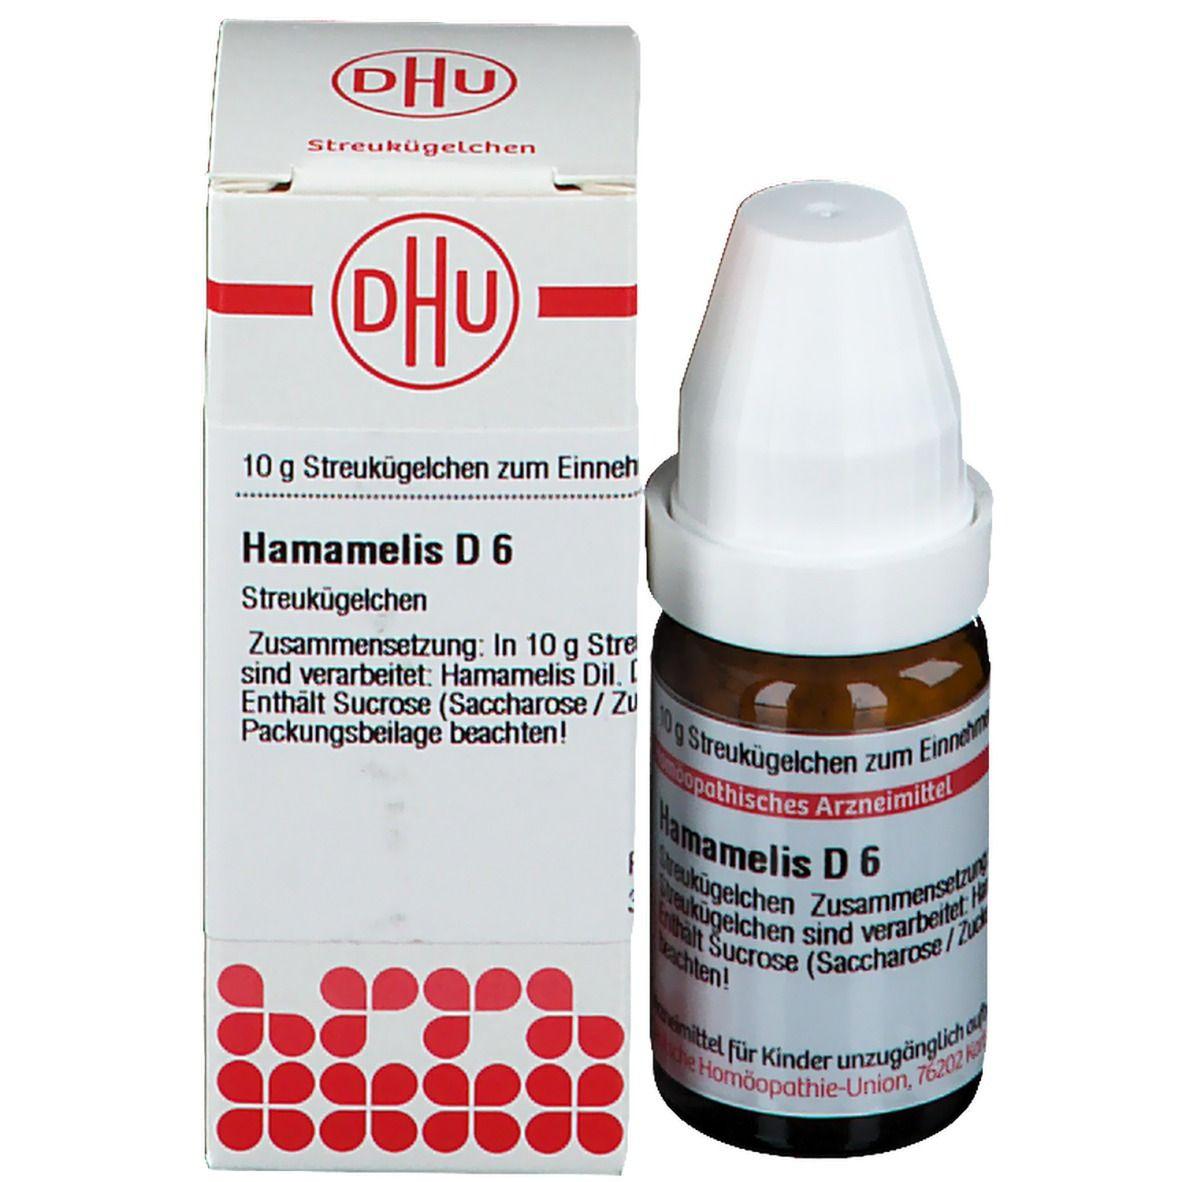 DHU Hamamelis D6